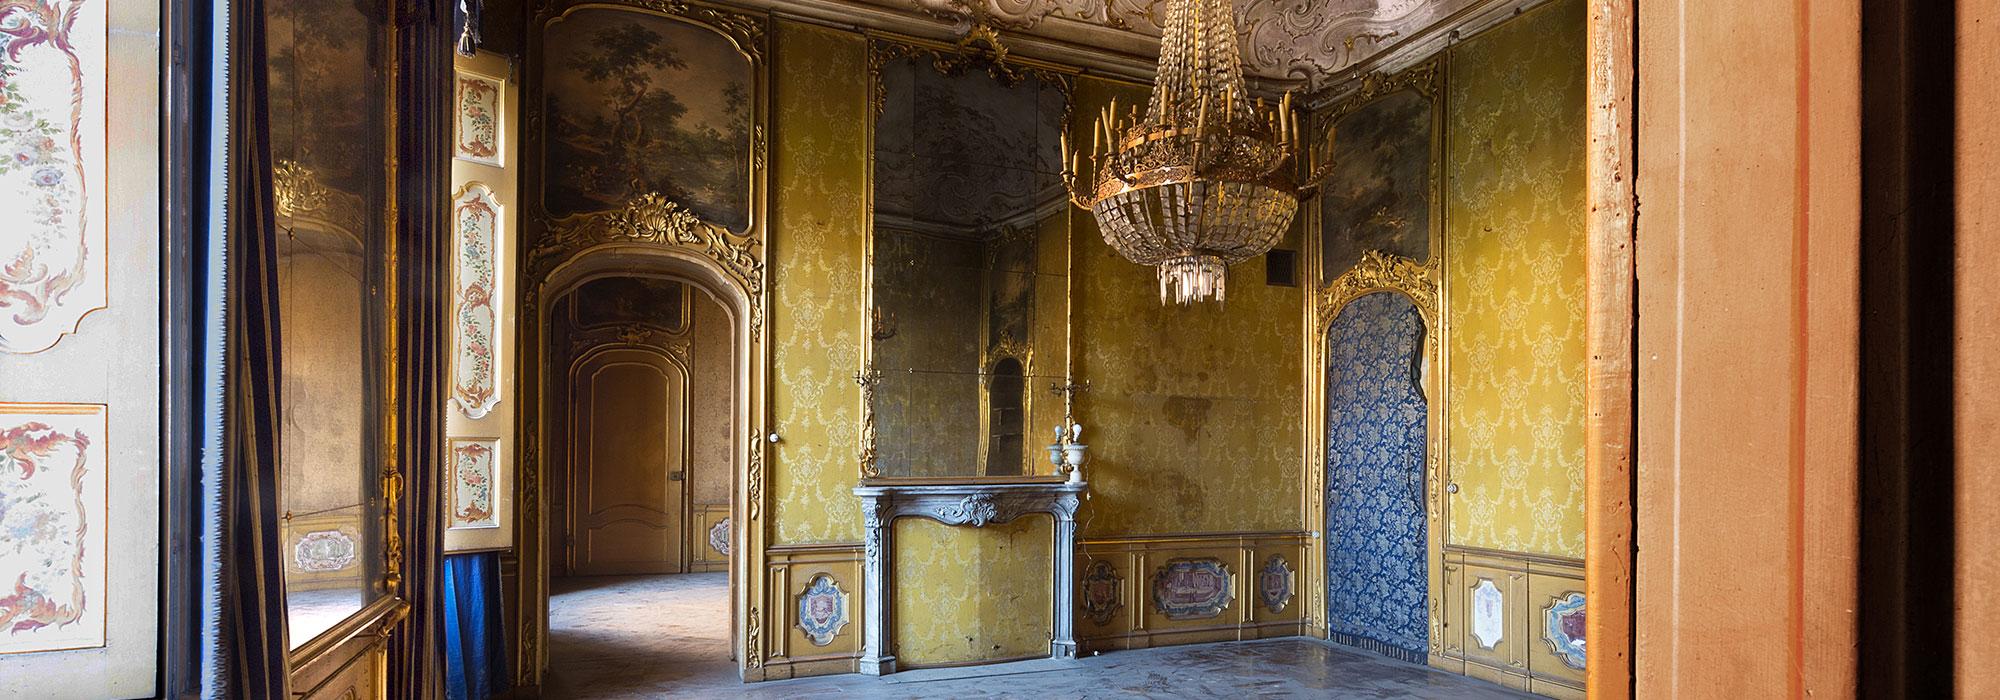 Palazzo Storico ad Asti